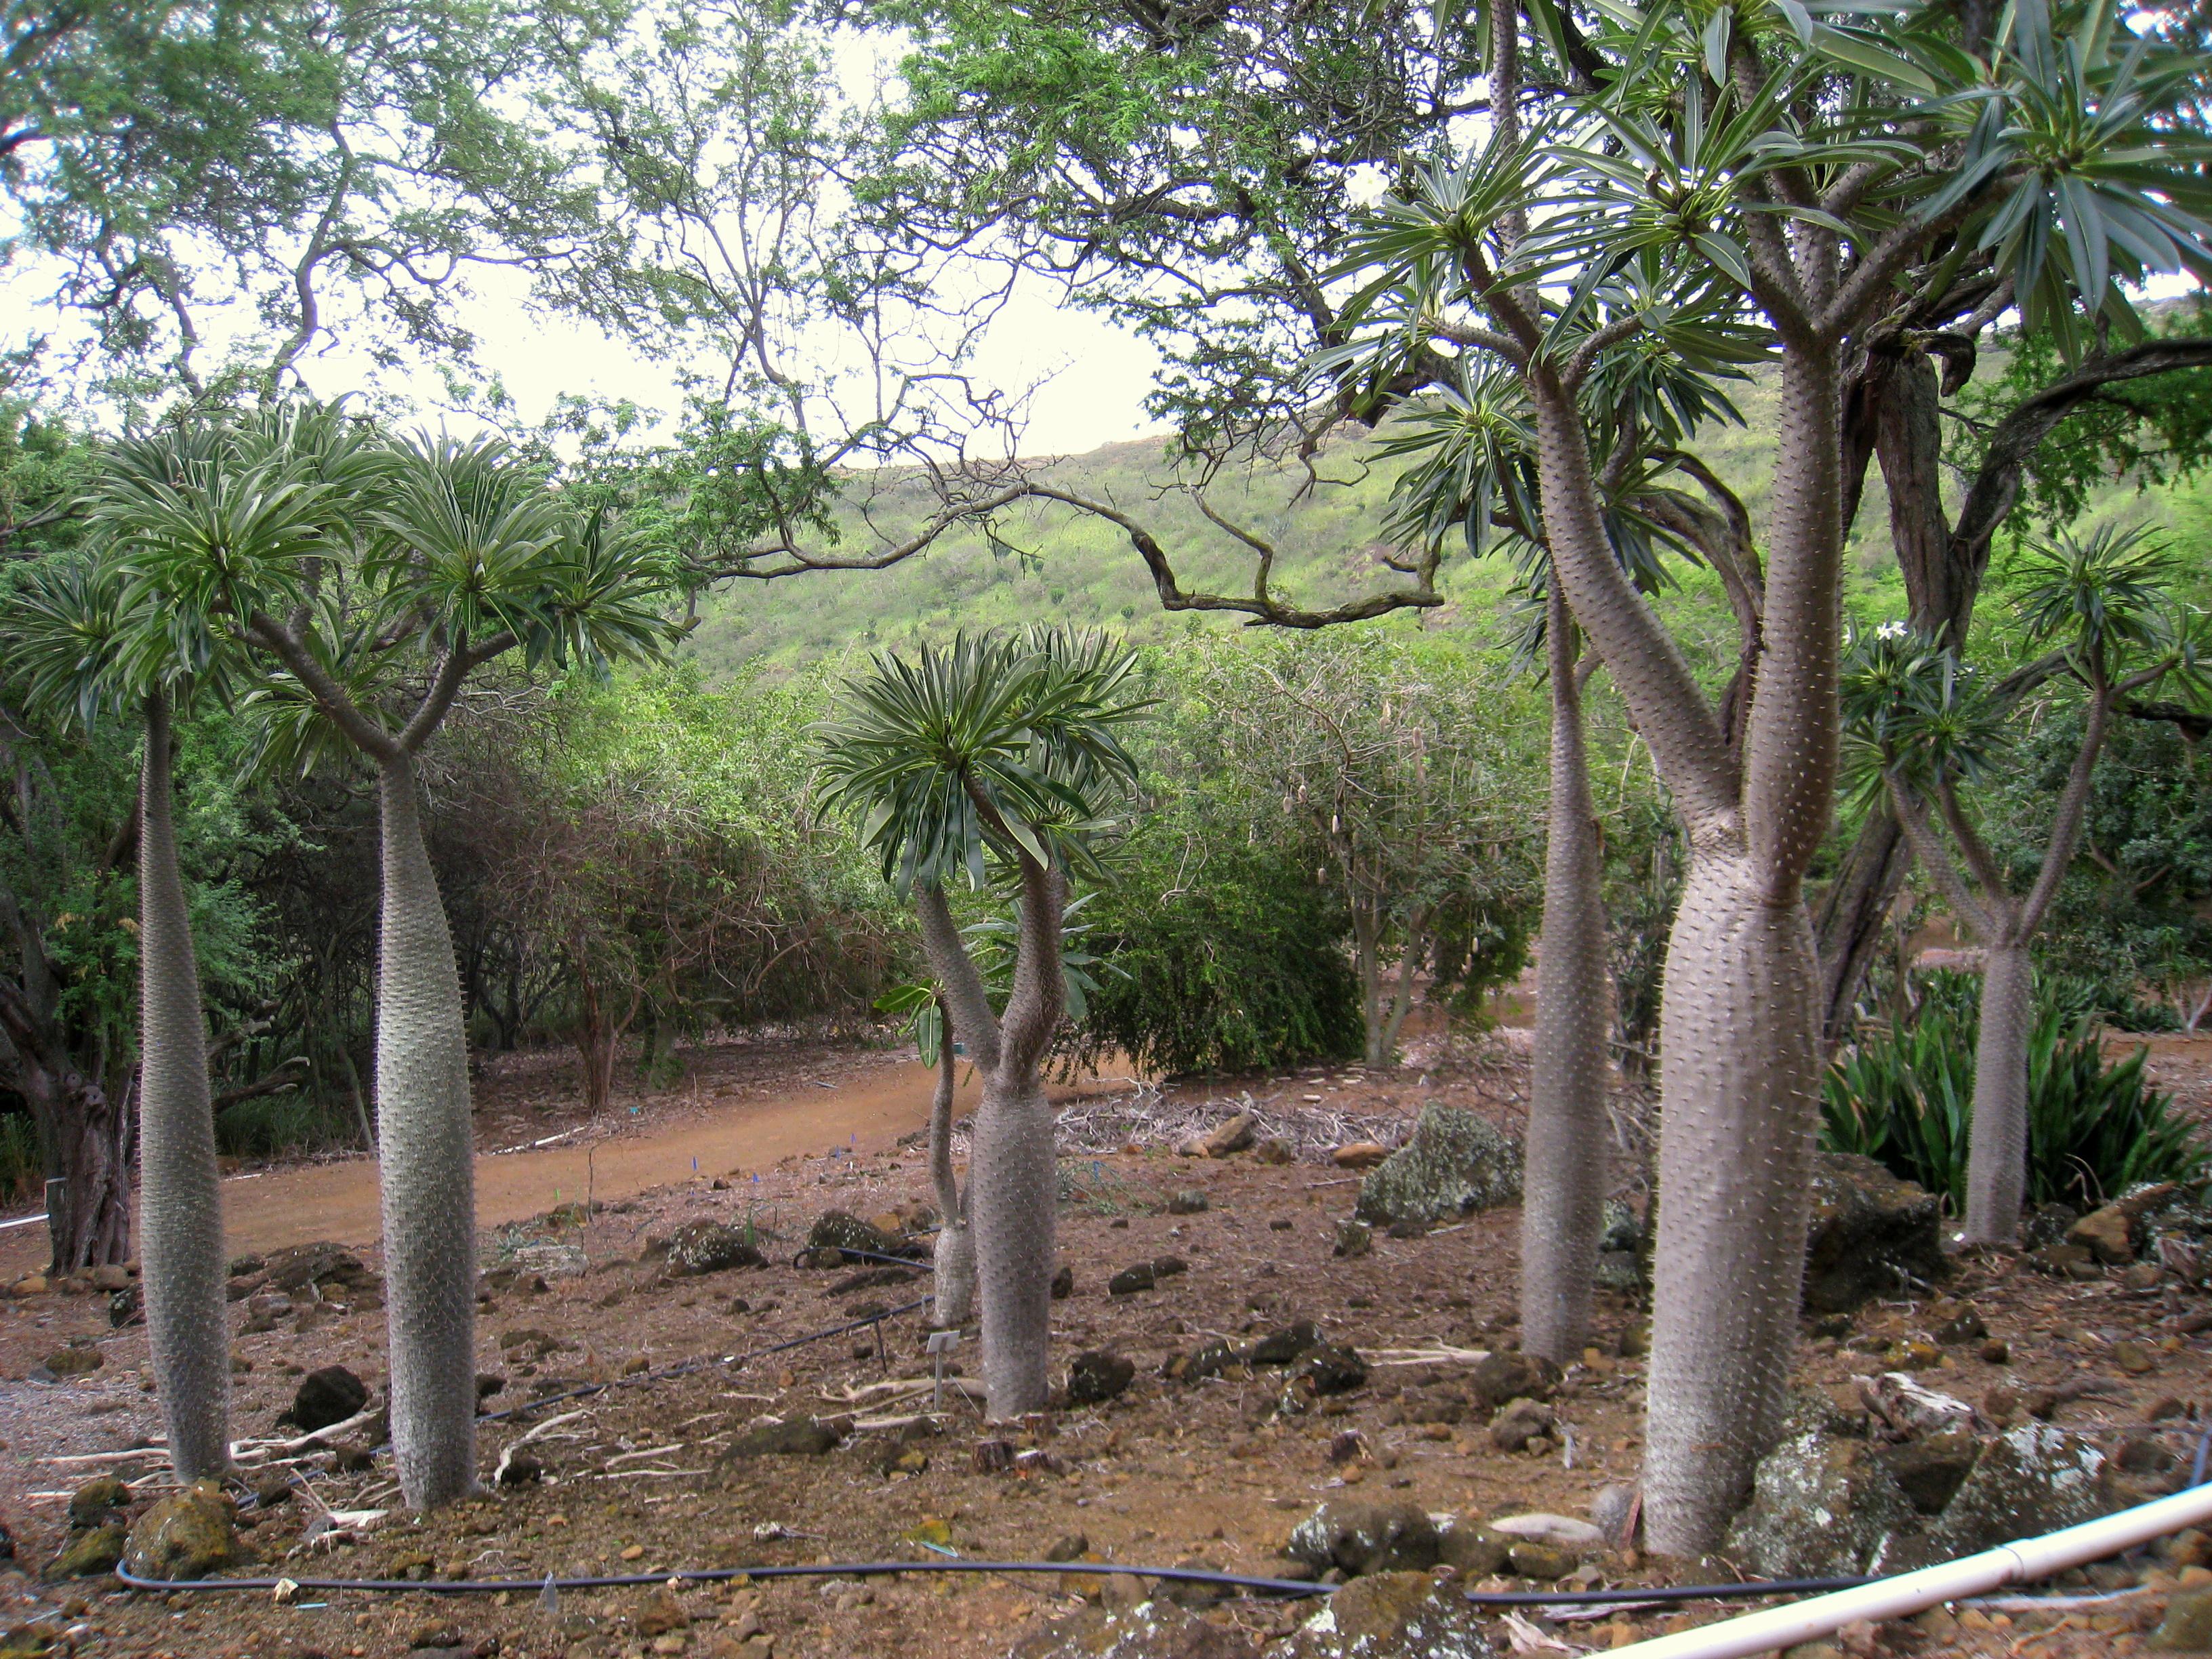 File Pachypodium Lamerei Var Ramosum Koko Crater Botanical Garden Img 2273 Jpg Wikimedia